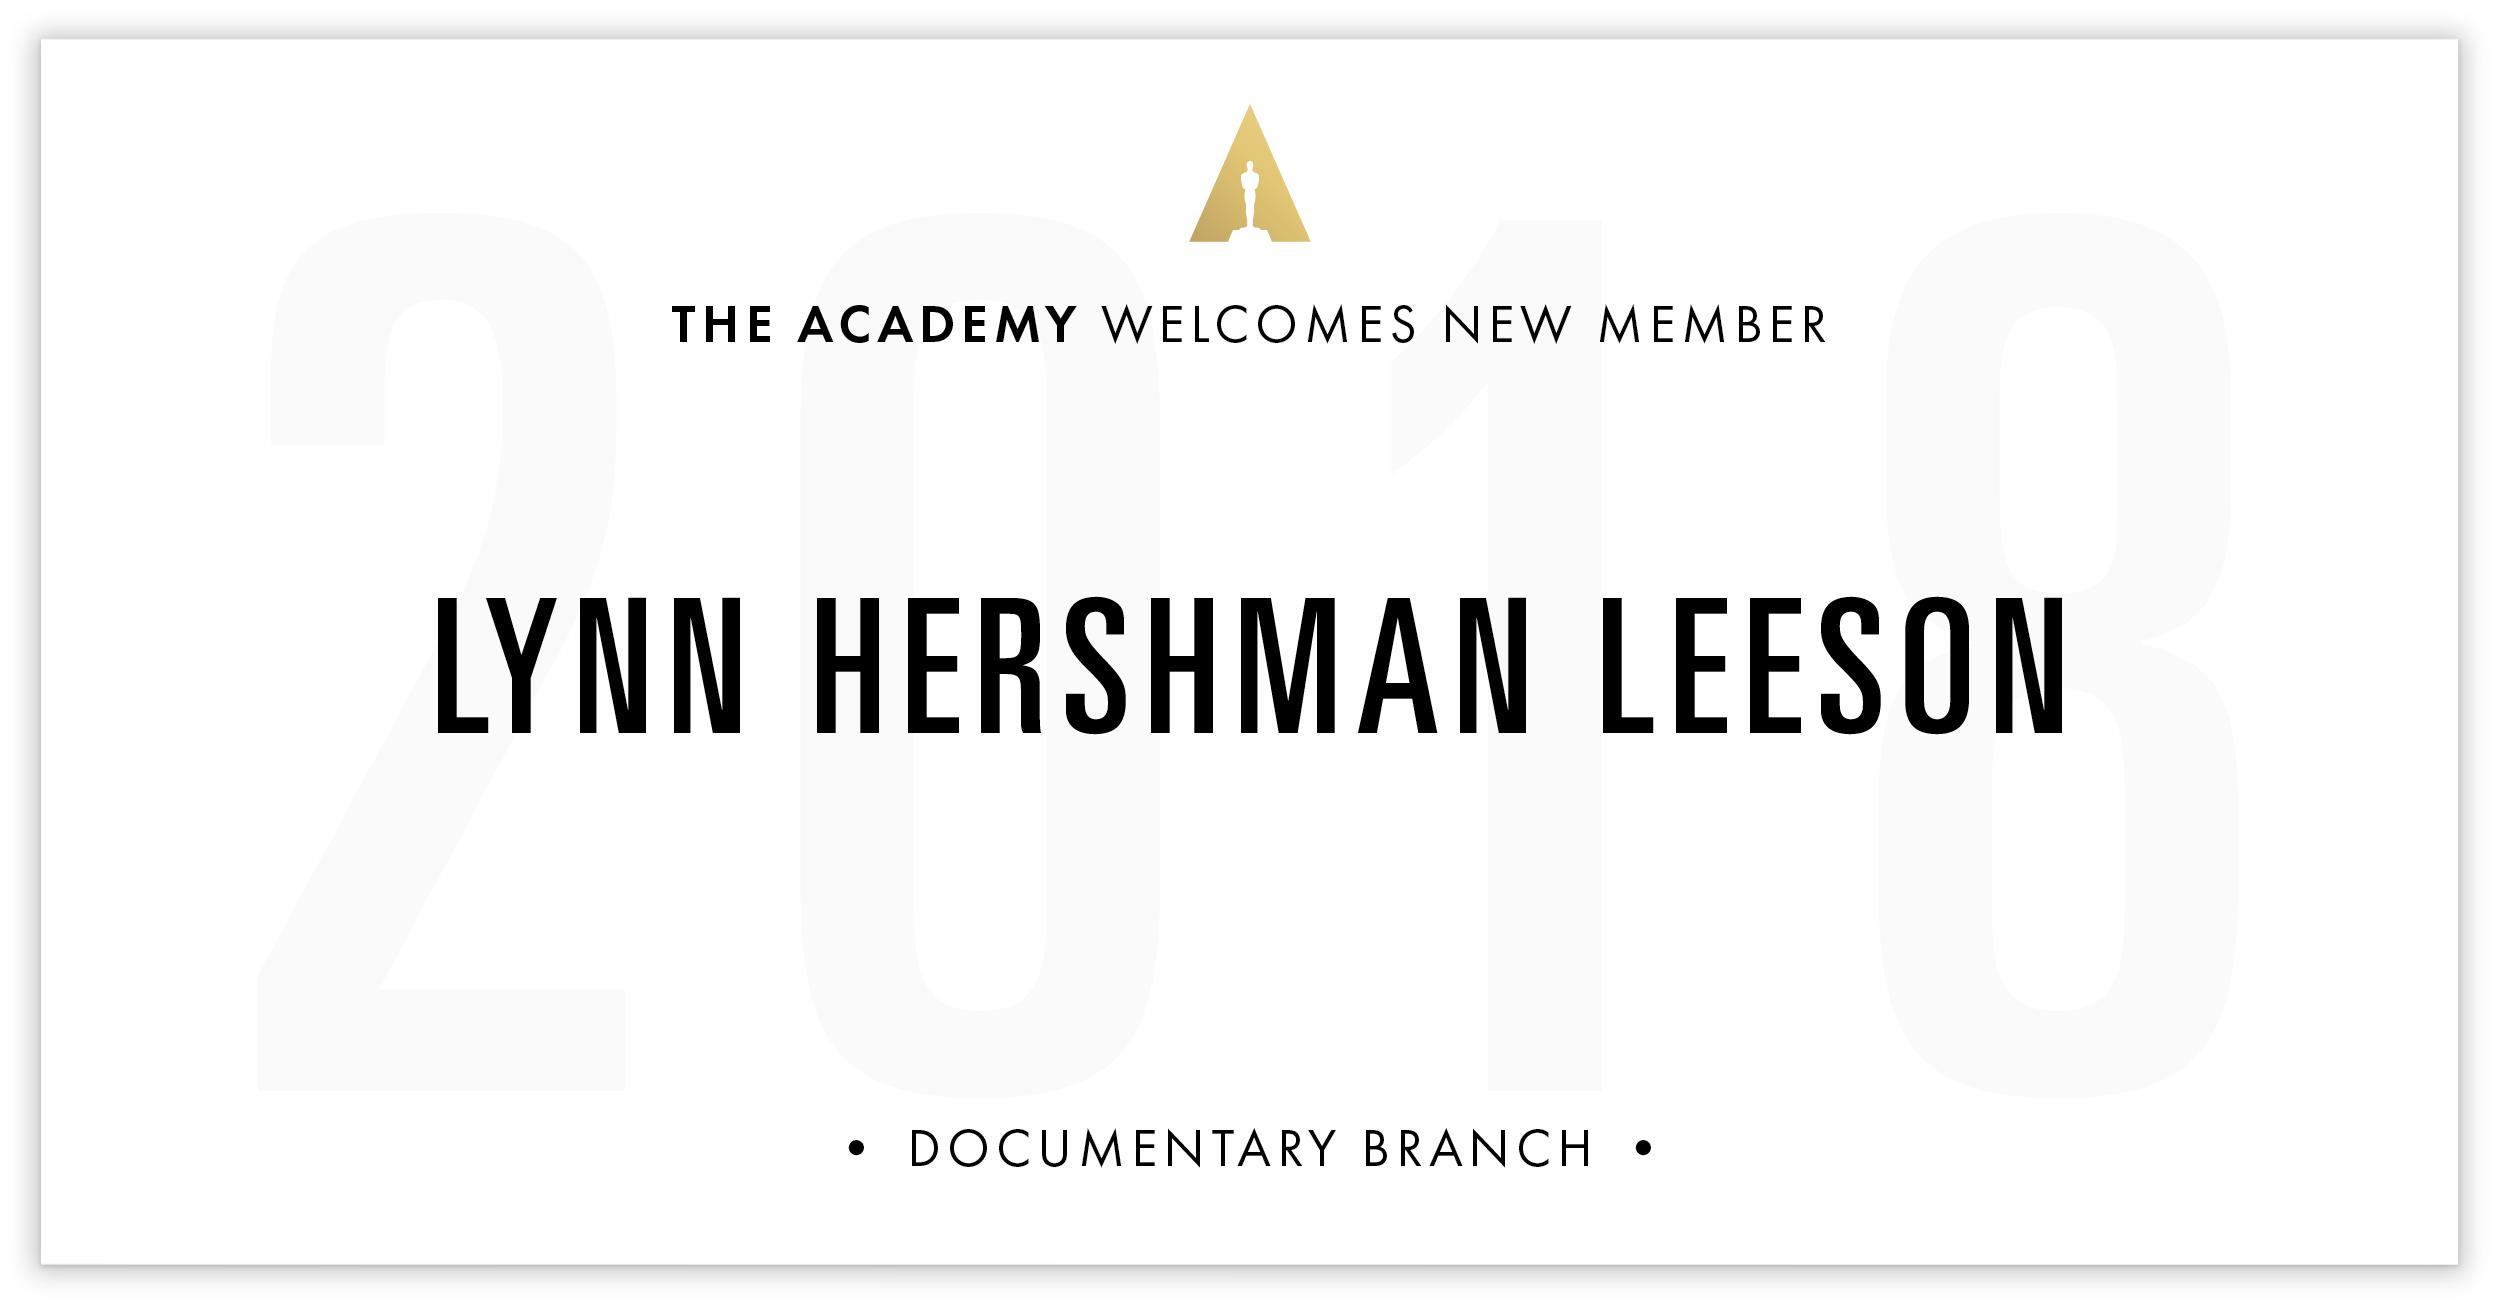 Lynn Hershman Leeson is invited!